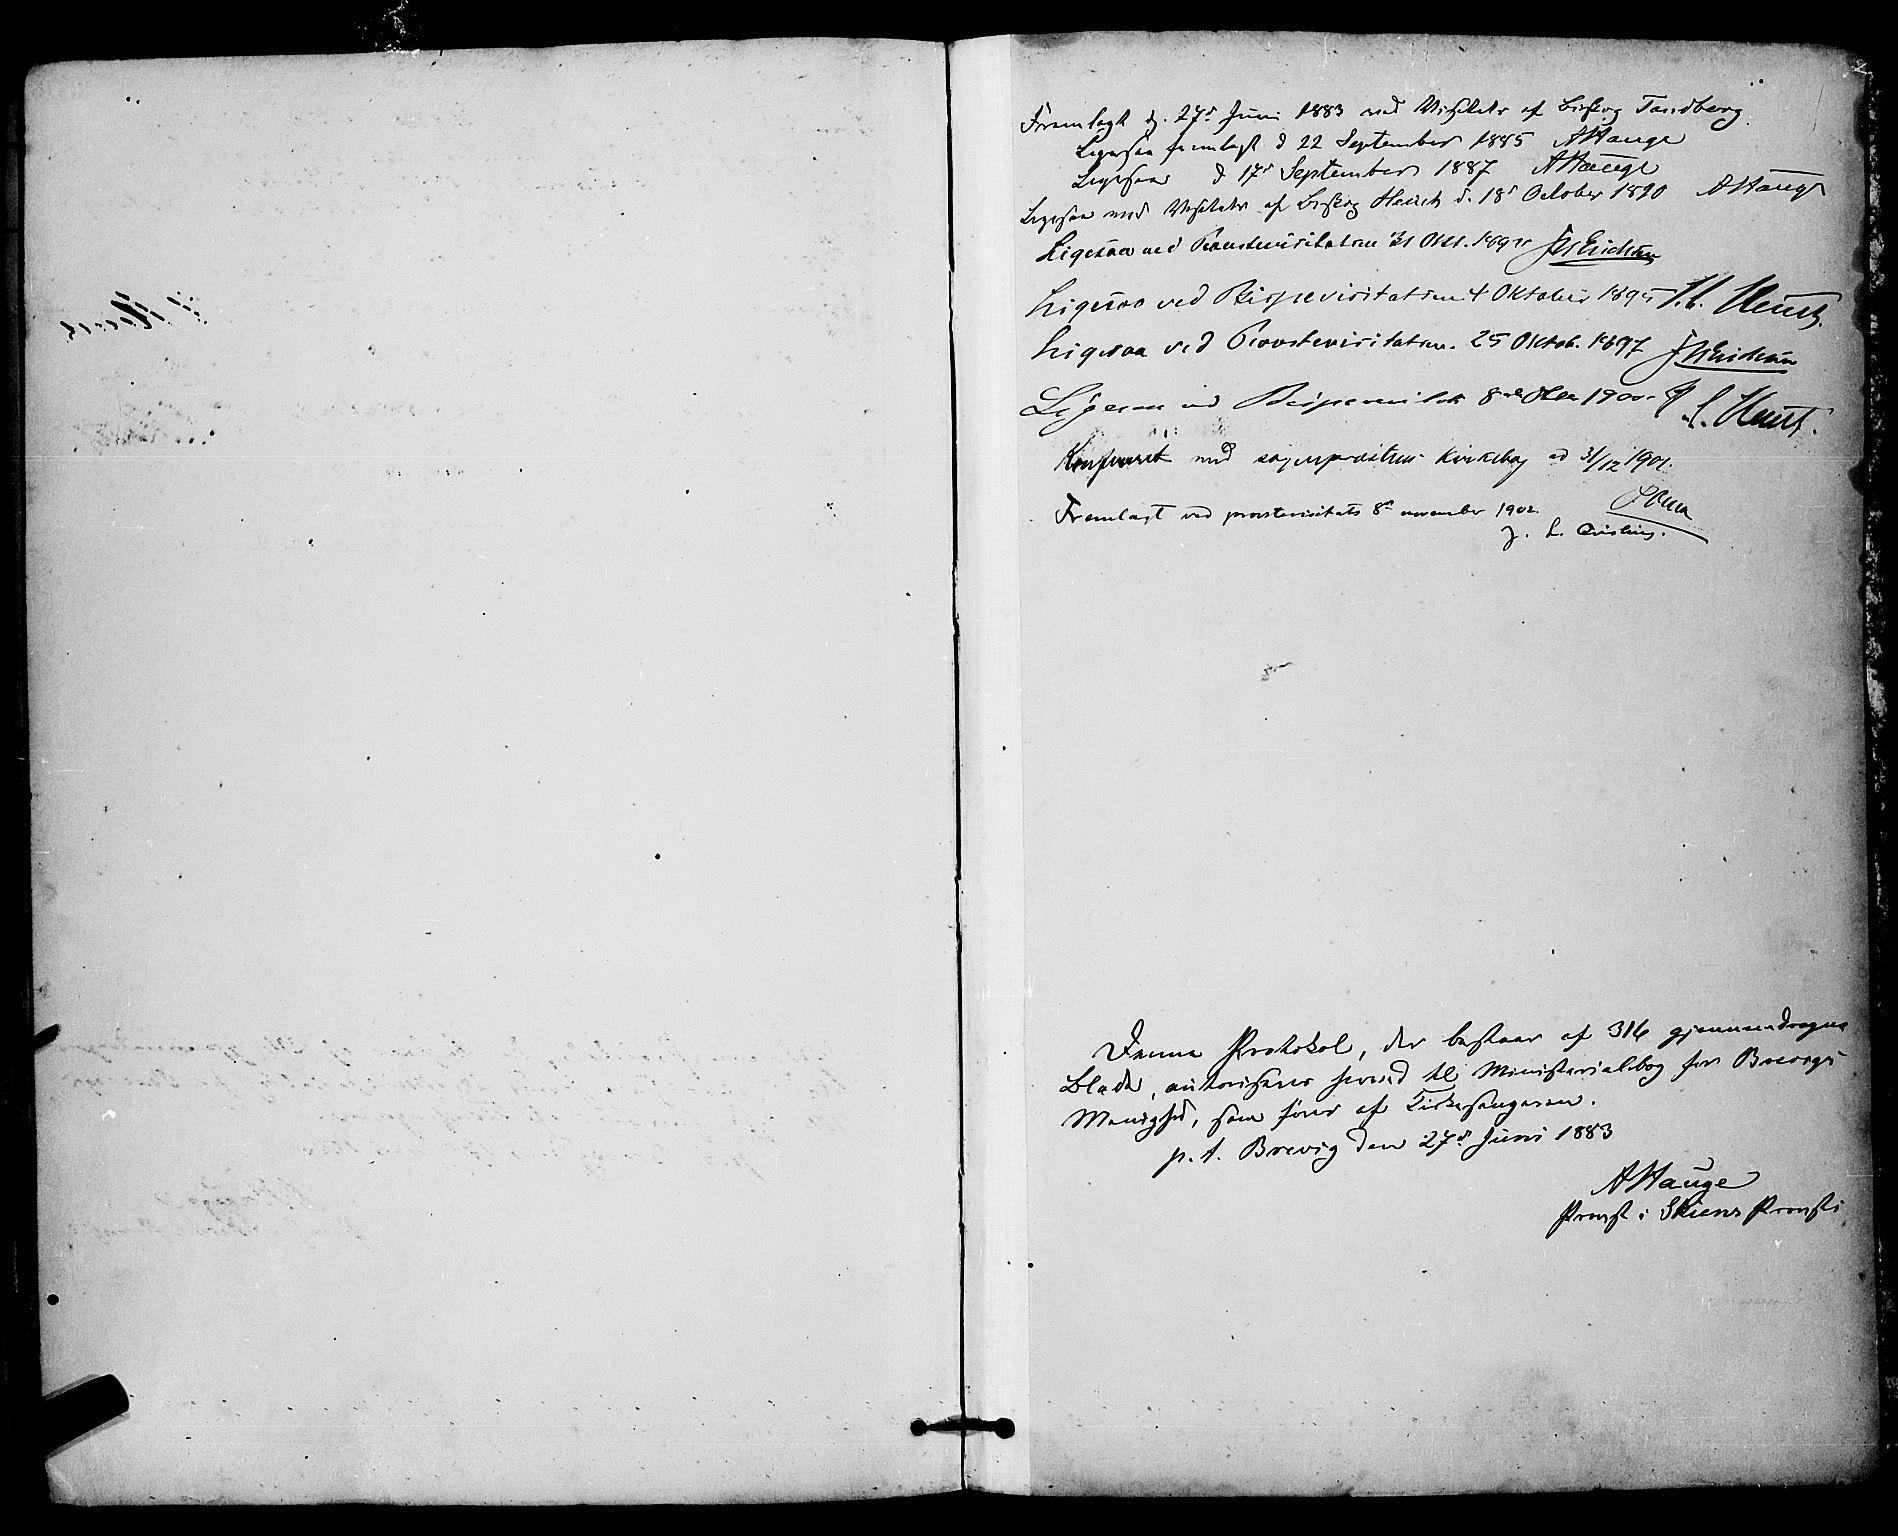 SAKO, Brevik kirkebøker, G/Ga/L0004: Klokkerbok nr. 4, 1882-1900